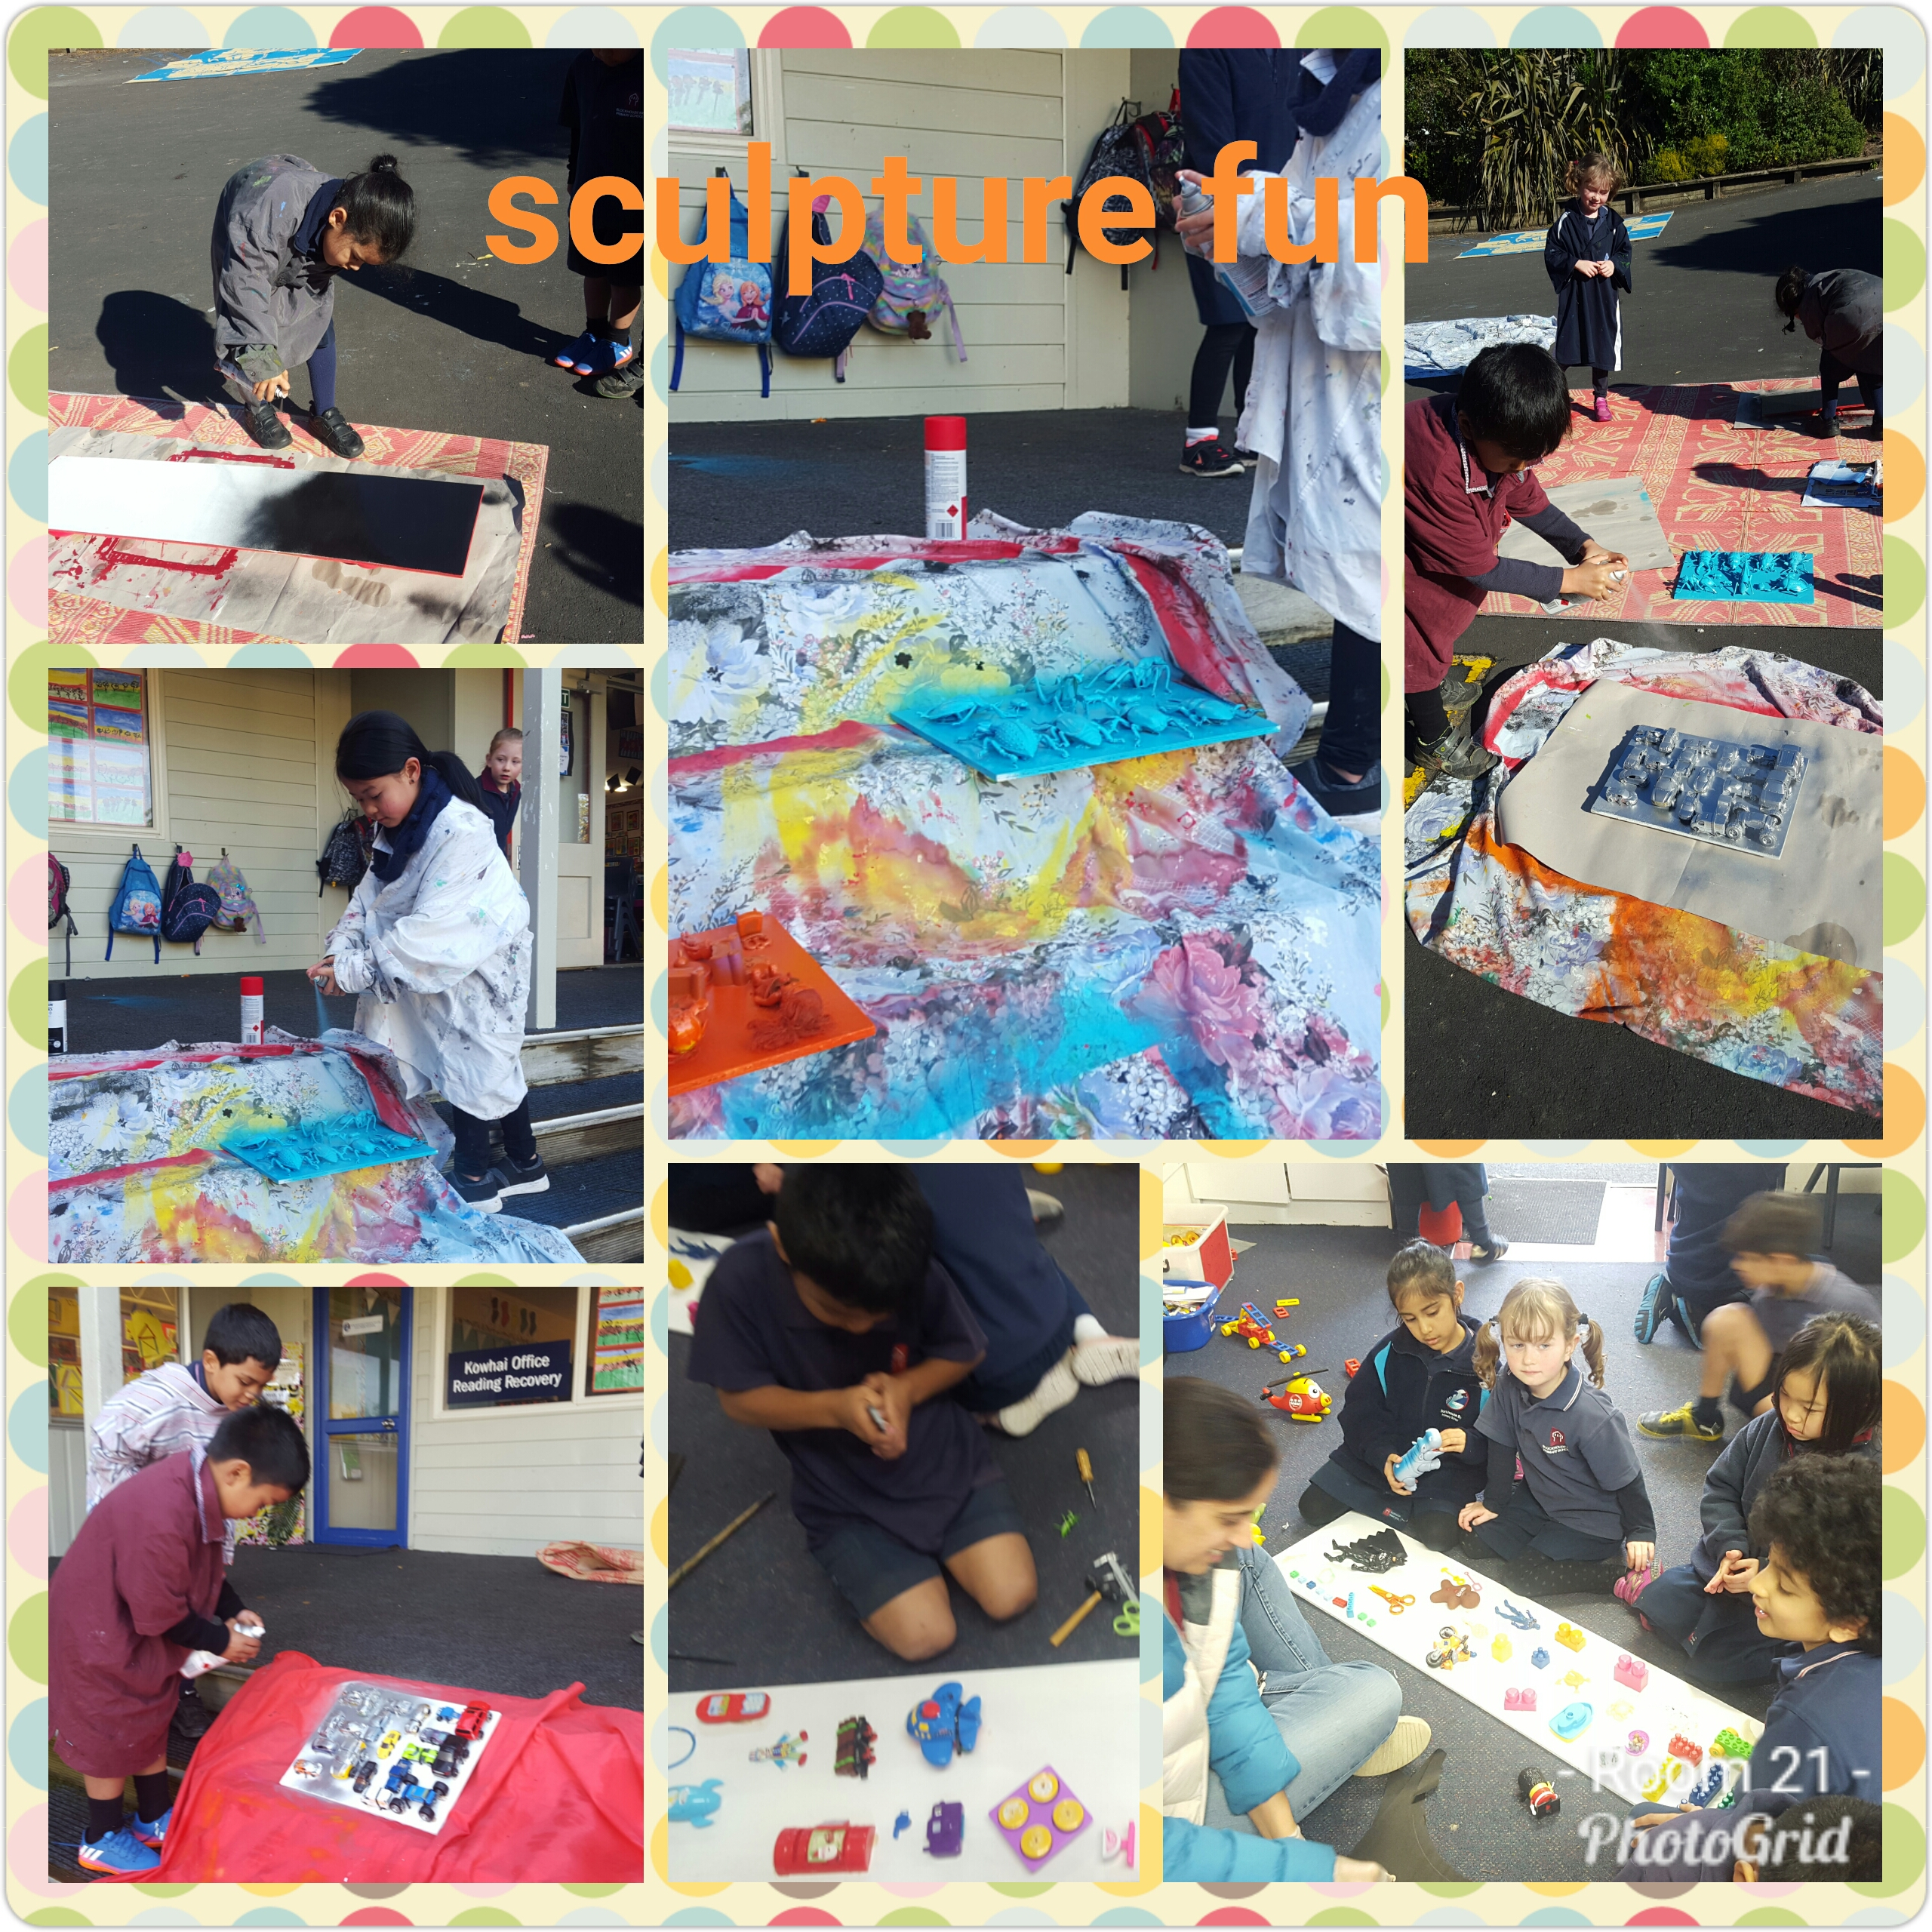 Blockhouse Bay Primary School - Sculpture Art Inquiry